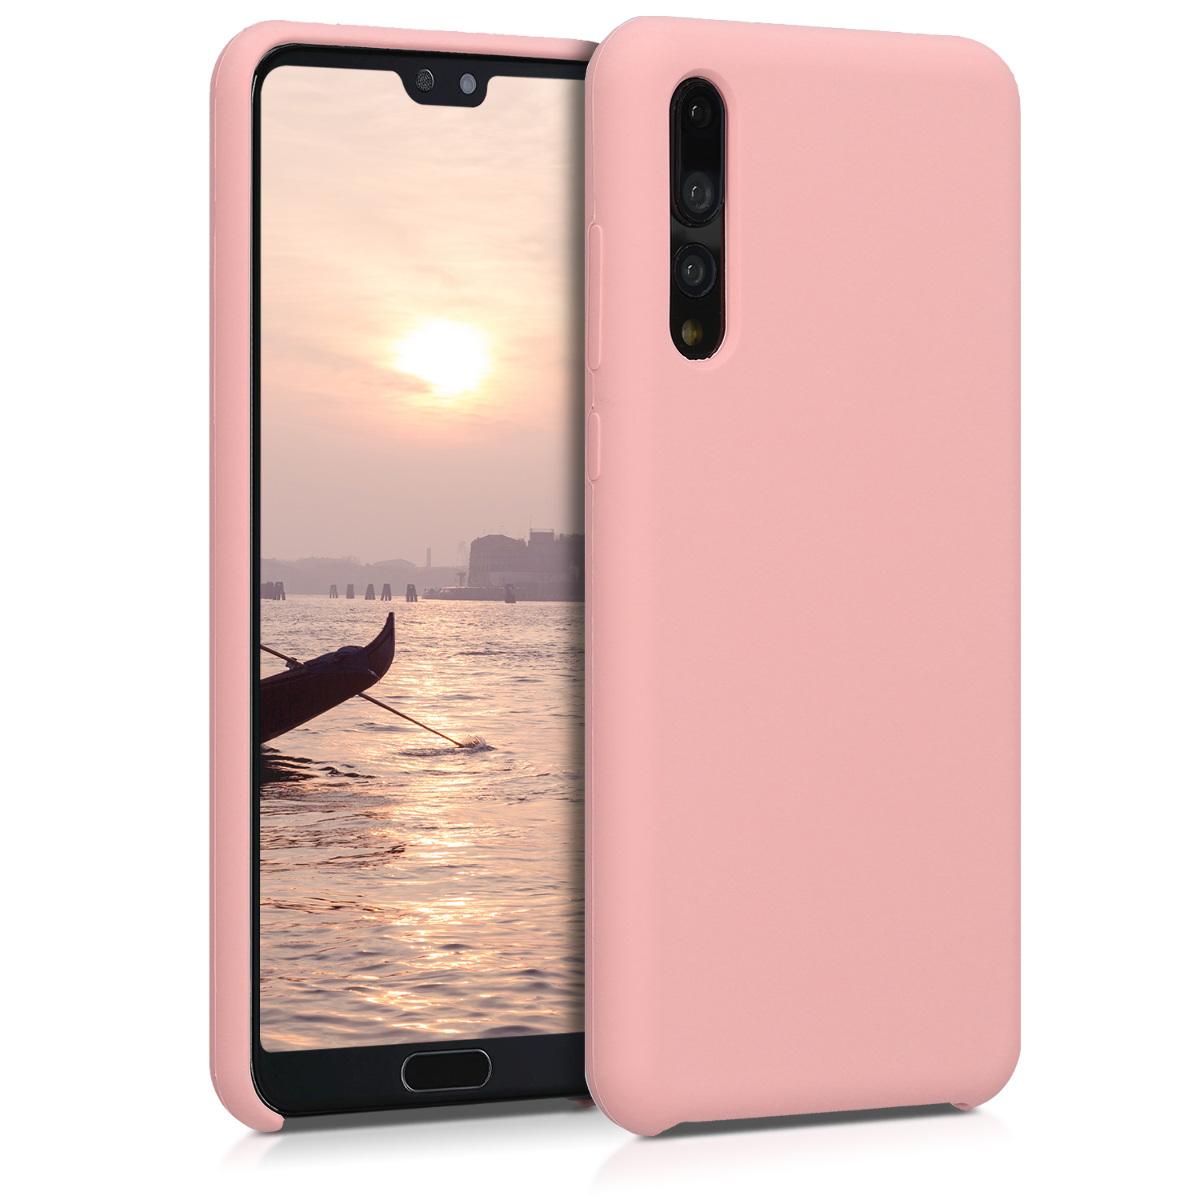 KW Soft Flexible Rubber Θήκη Σιλικόνης (TPU) - Huawei P20 Pro - Ανοιχτό ροζ (47706.89)